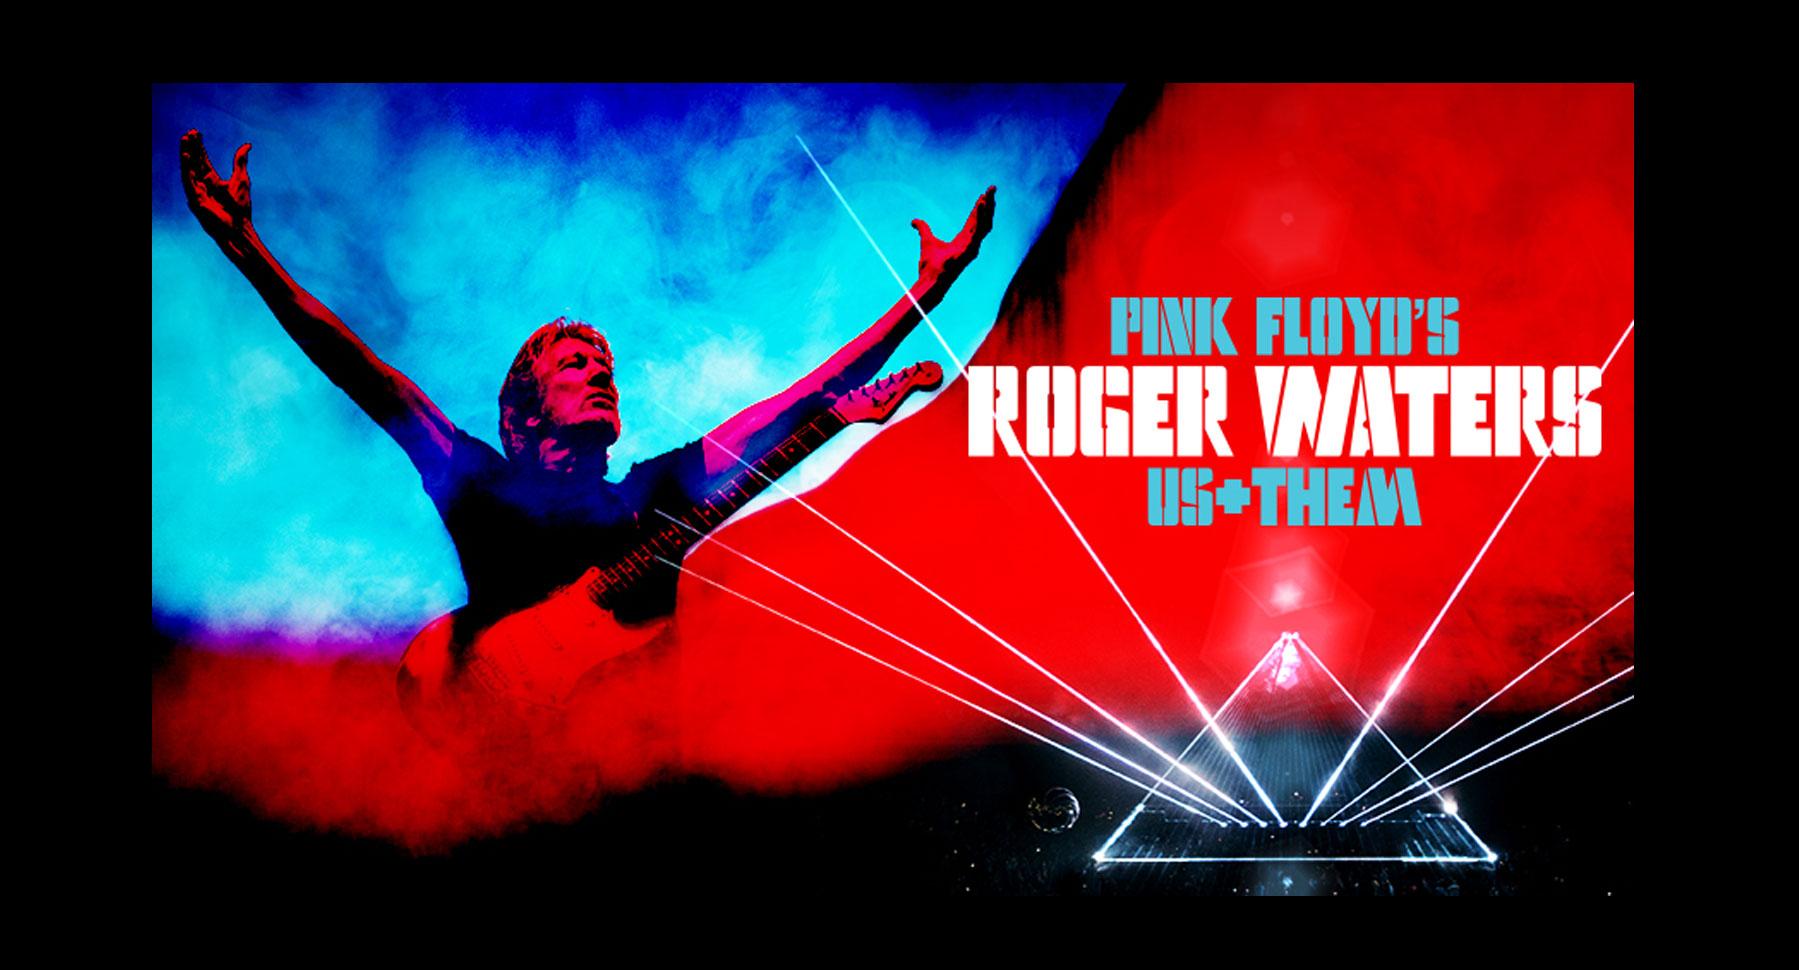 RogerWatersParallax